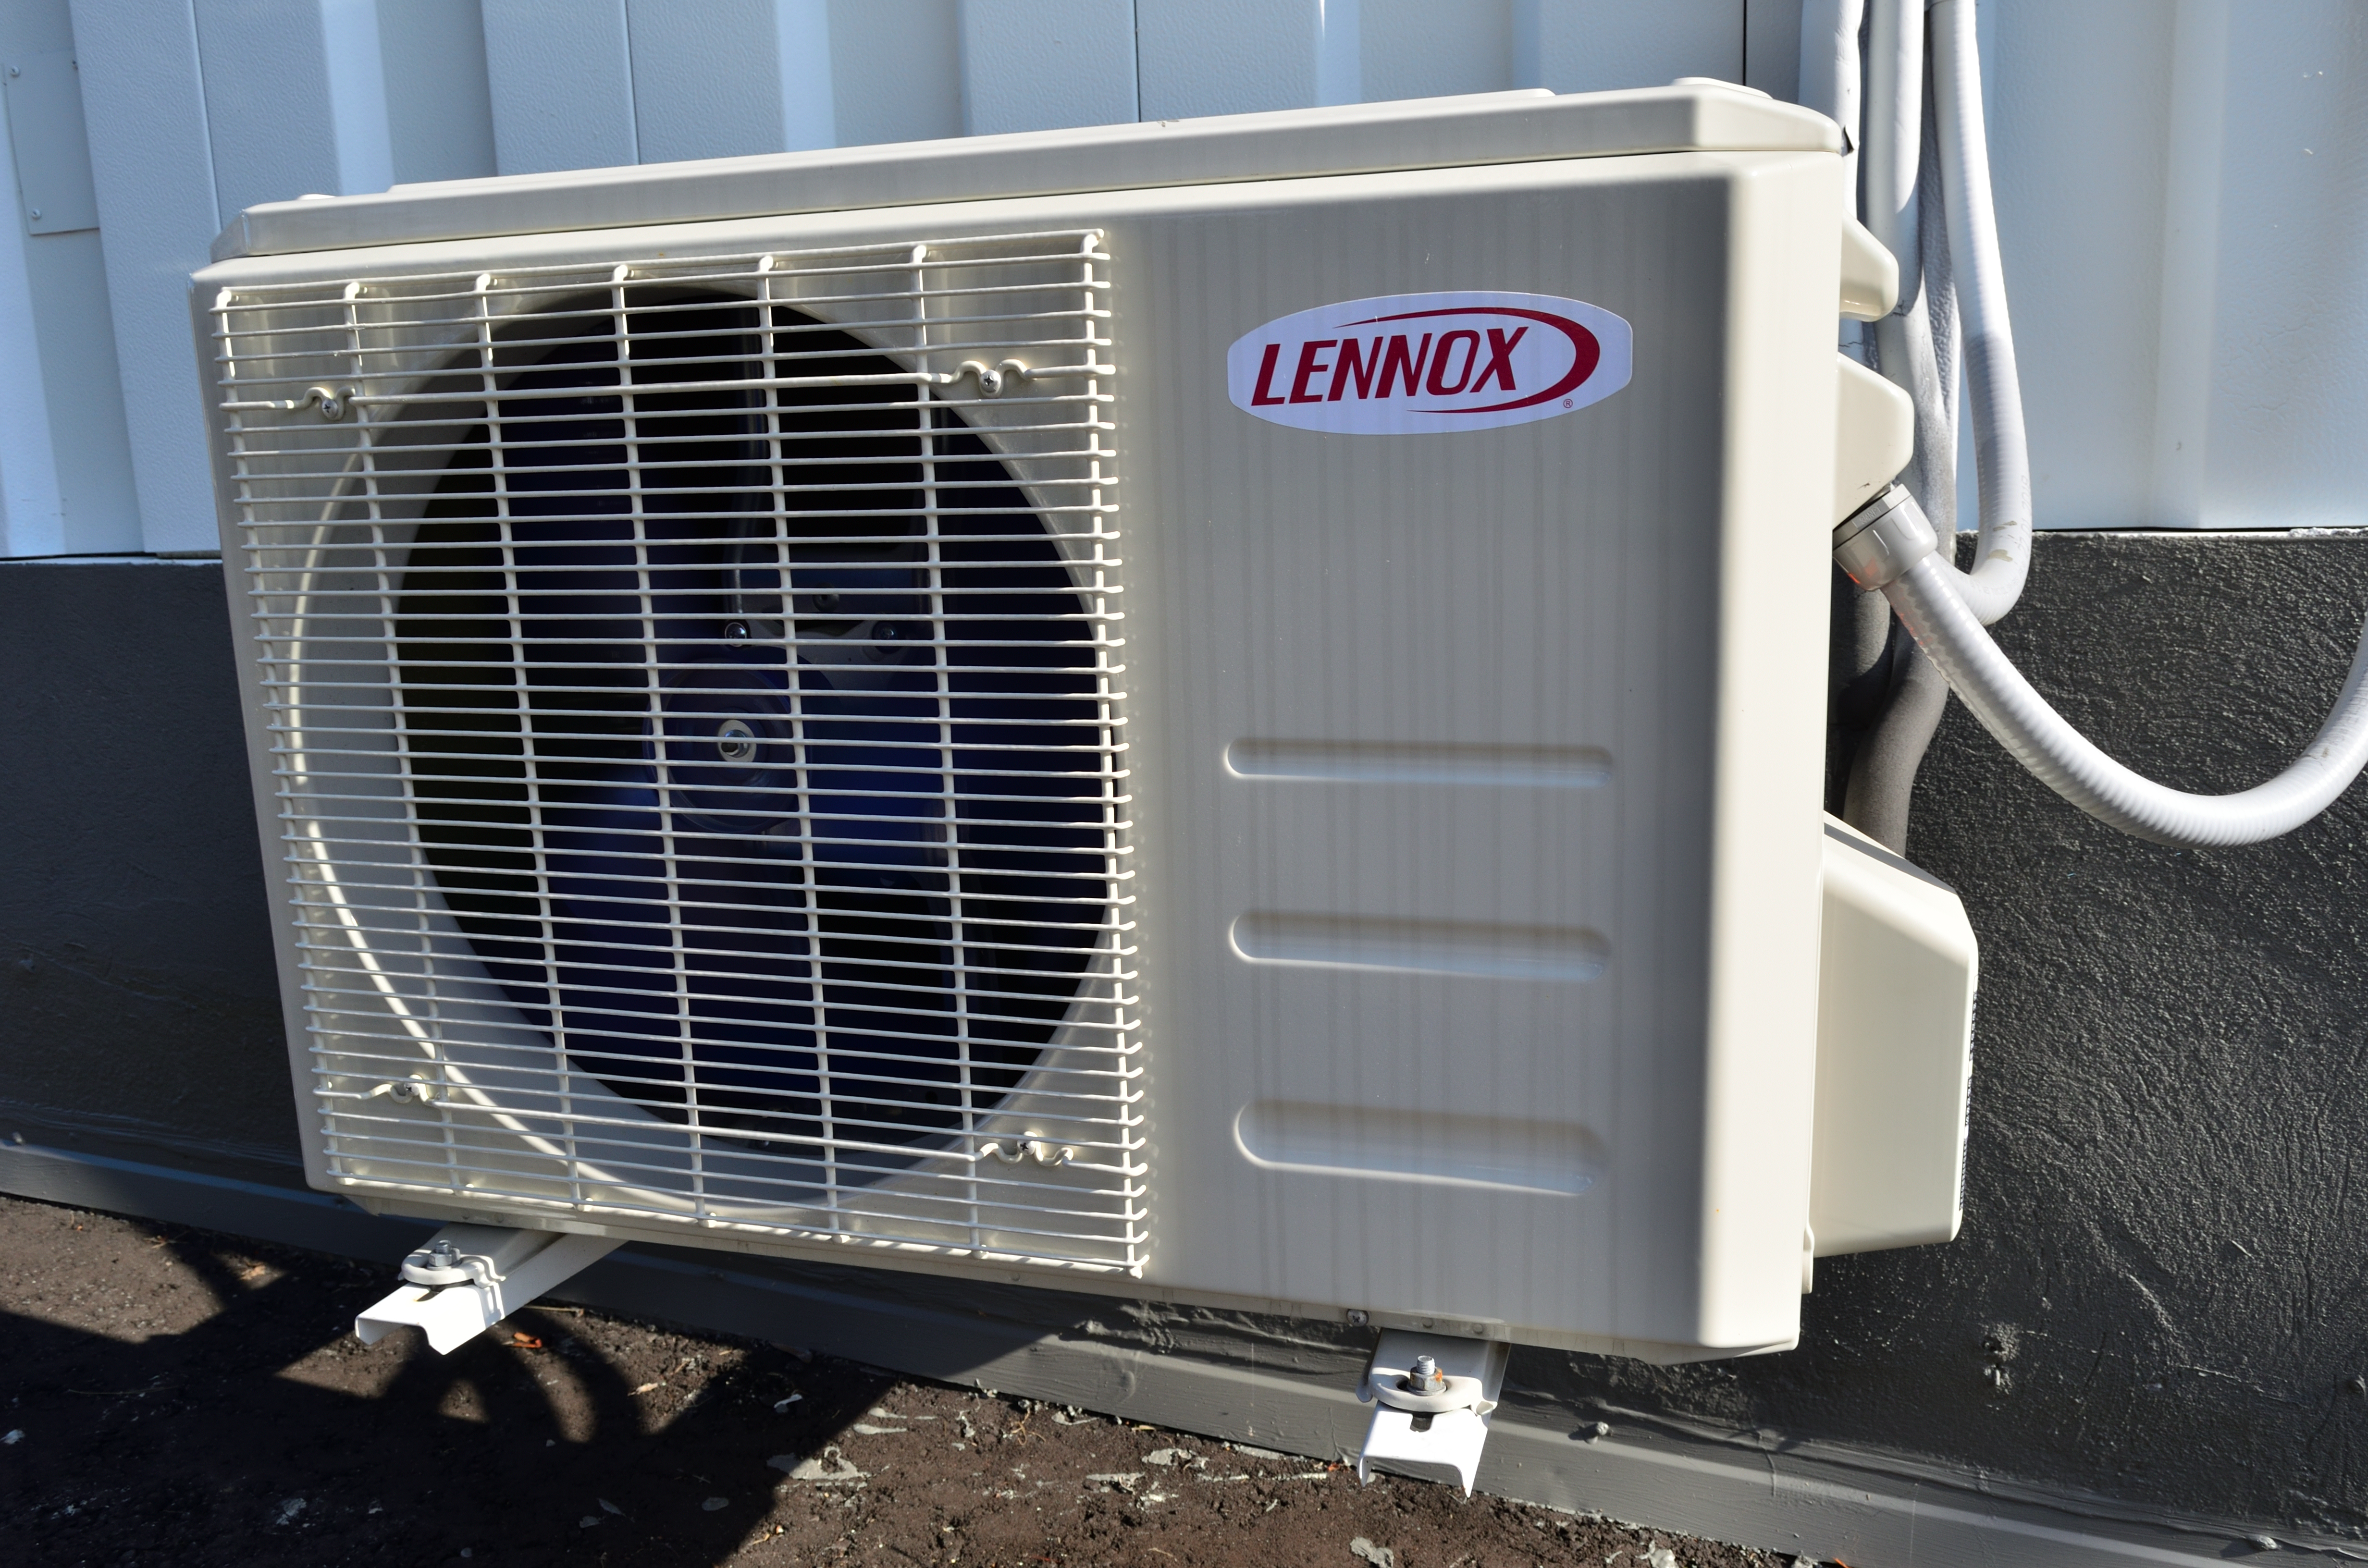 Lennox Air Conditioning >> Lennox International Wikipedia